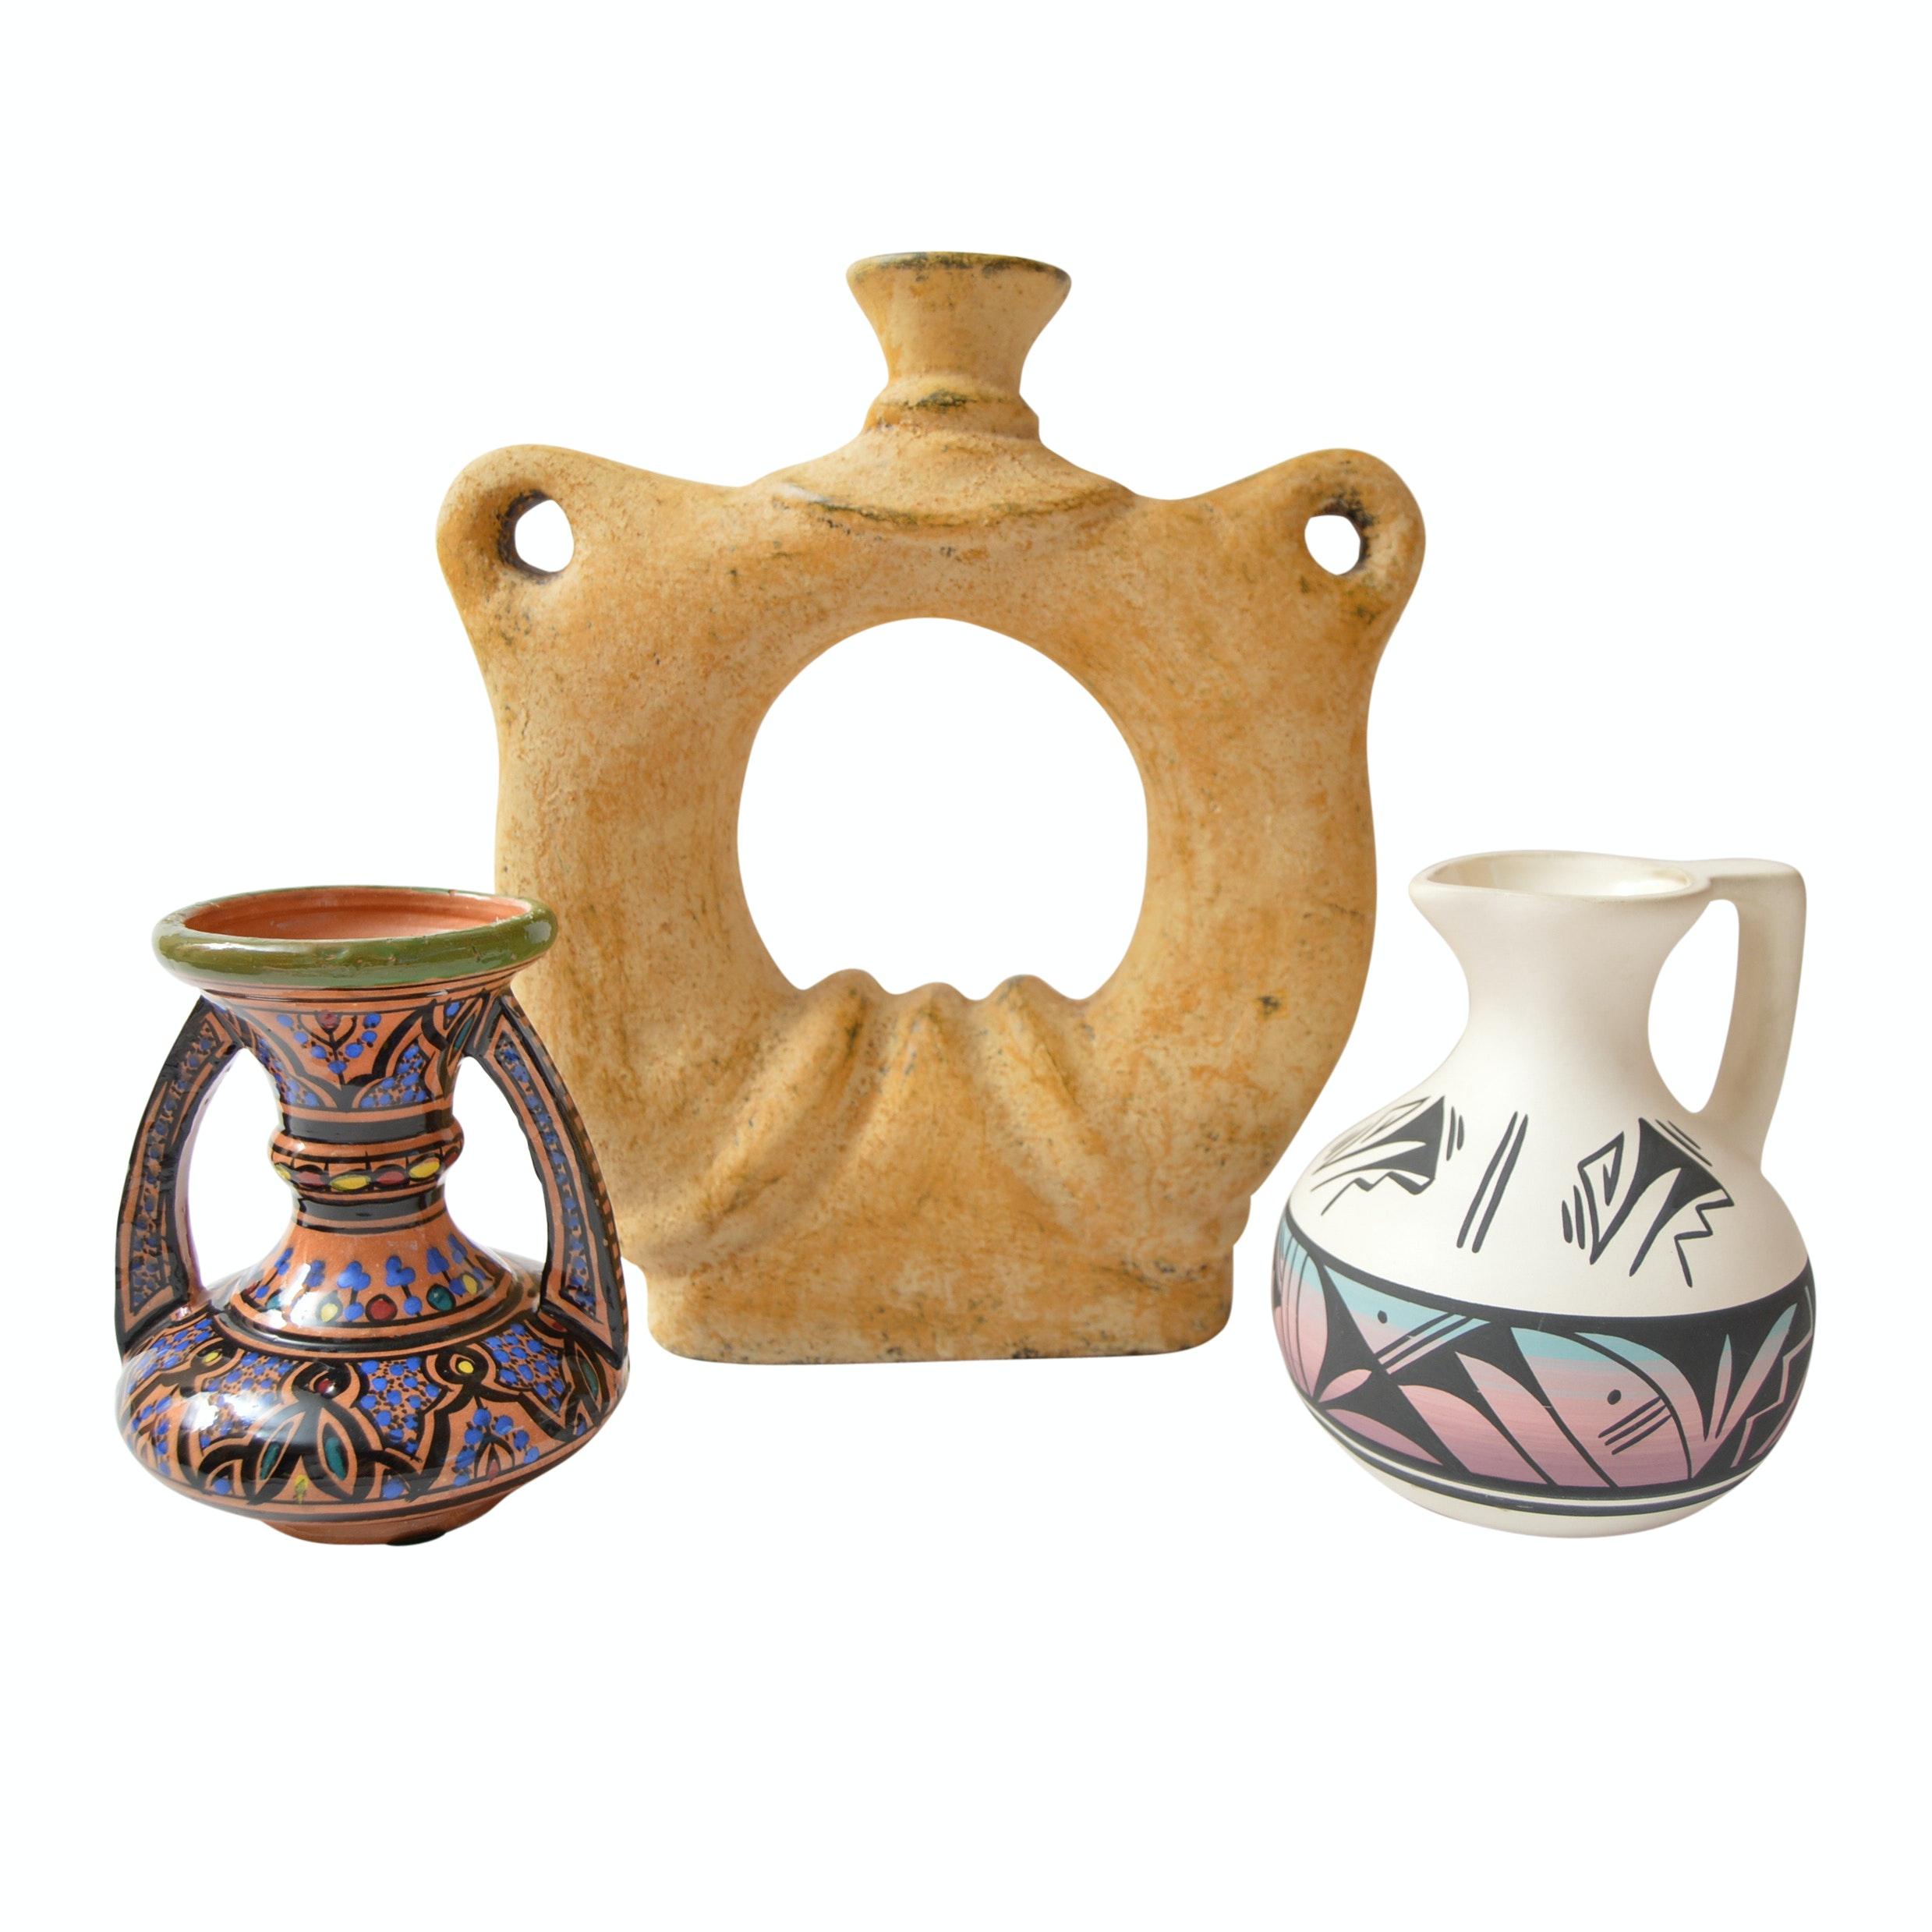 Signed Handmade Pottery